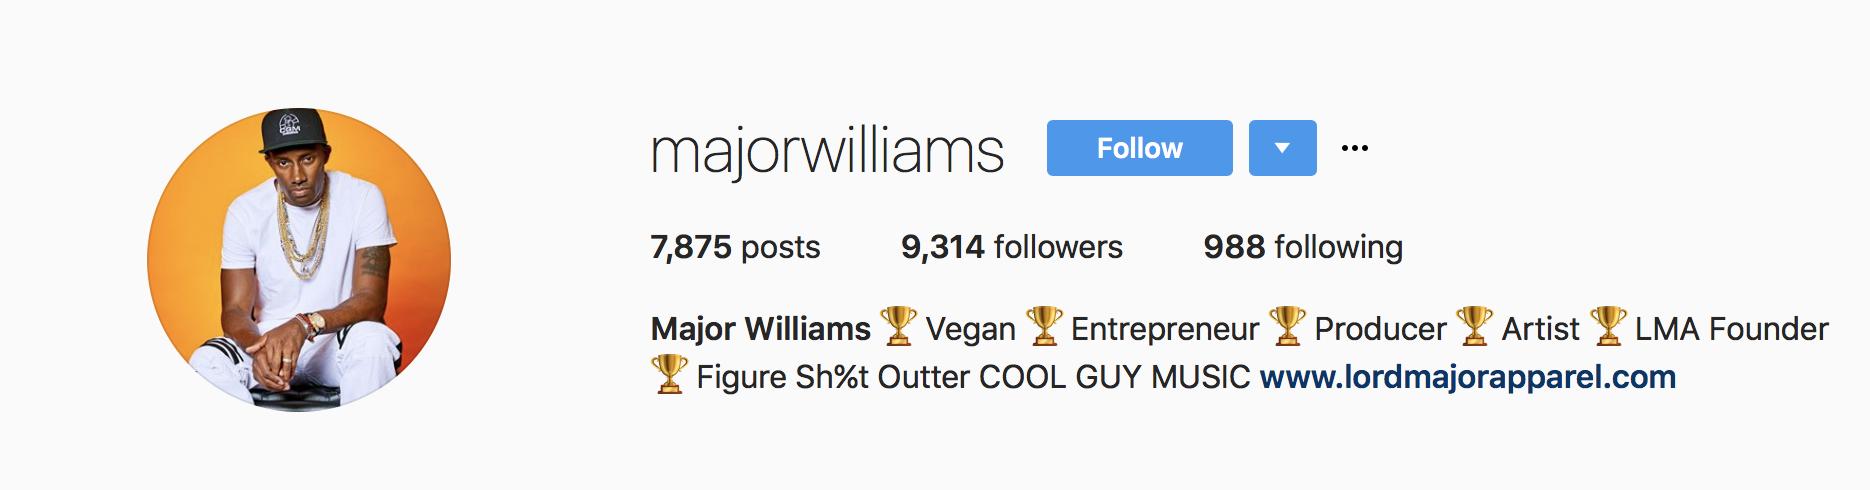 Major Williams Instagram